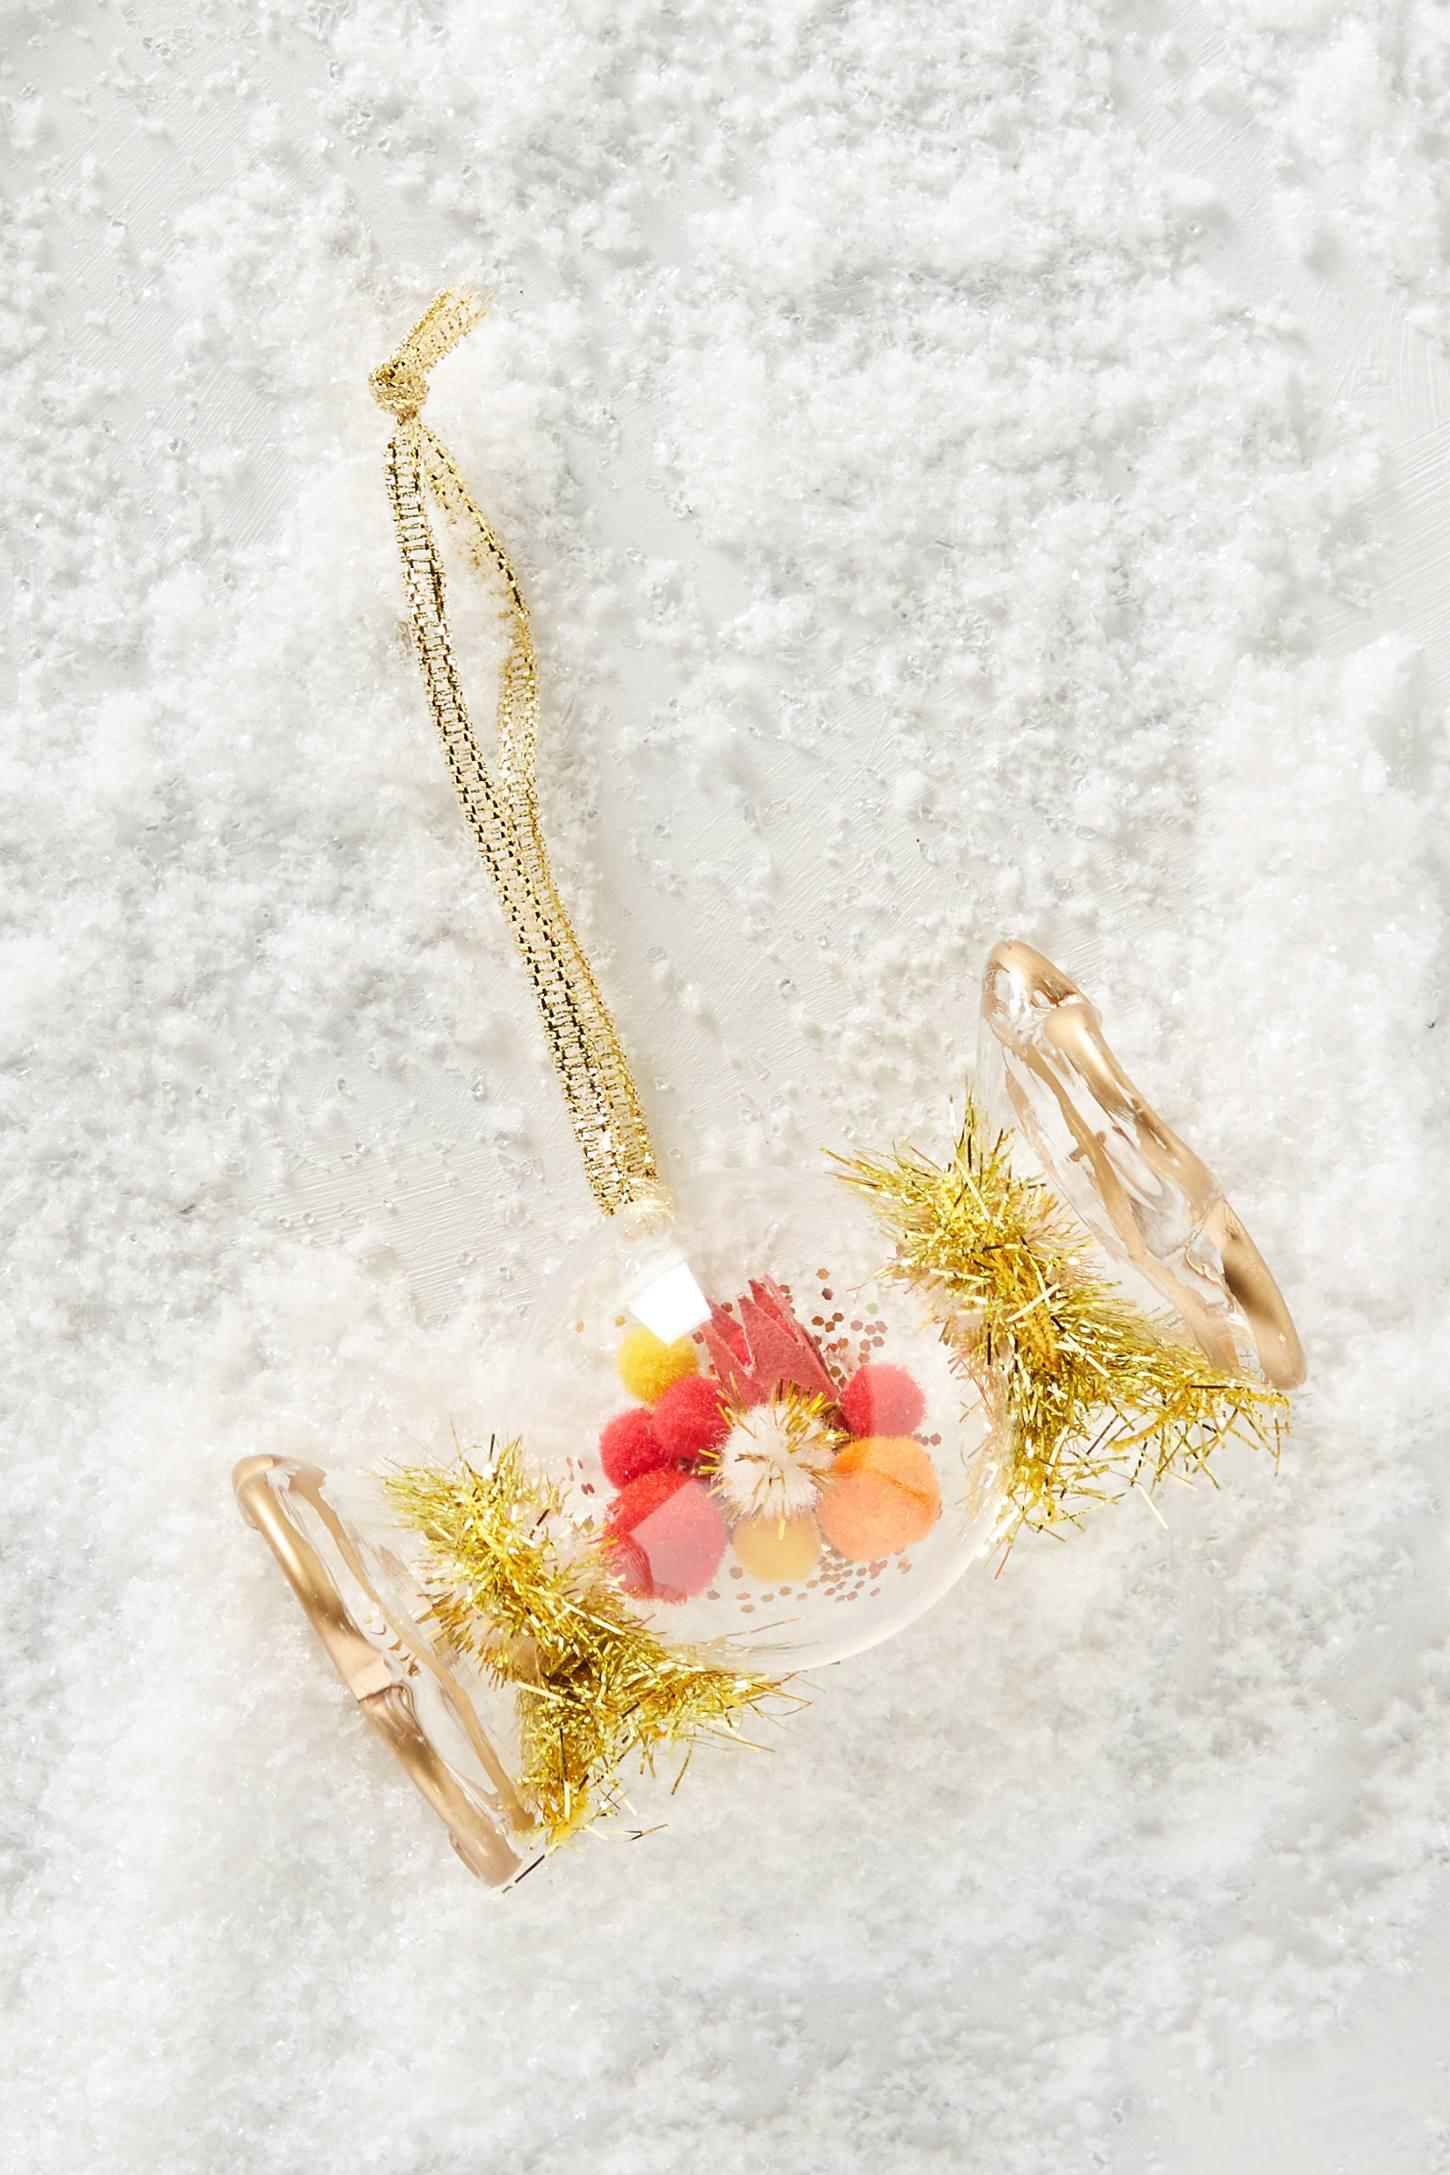 Christmas Cracker Ornament